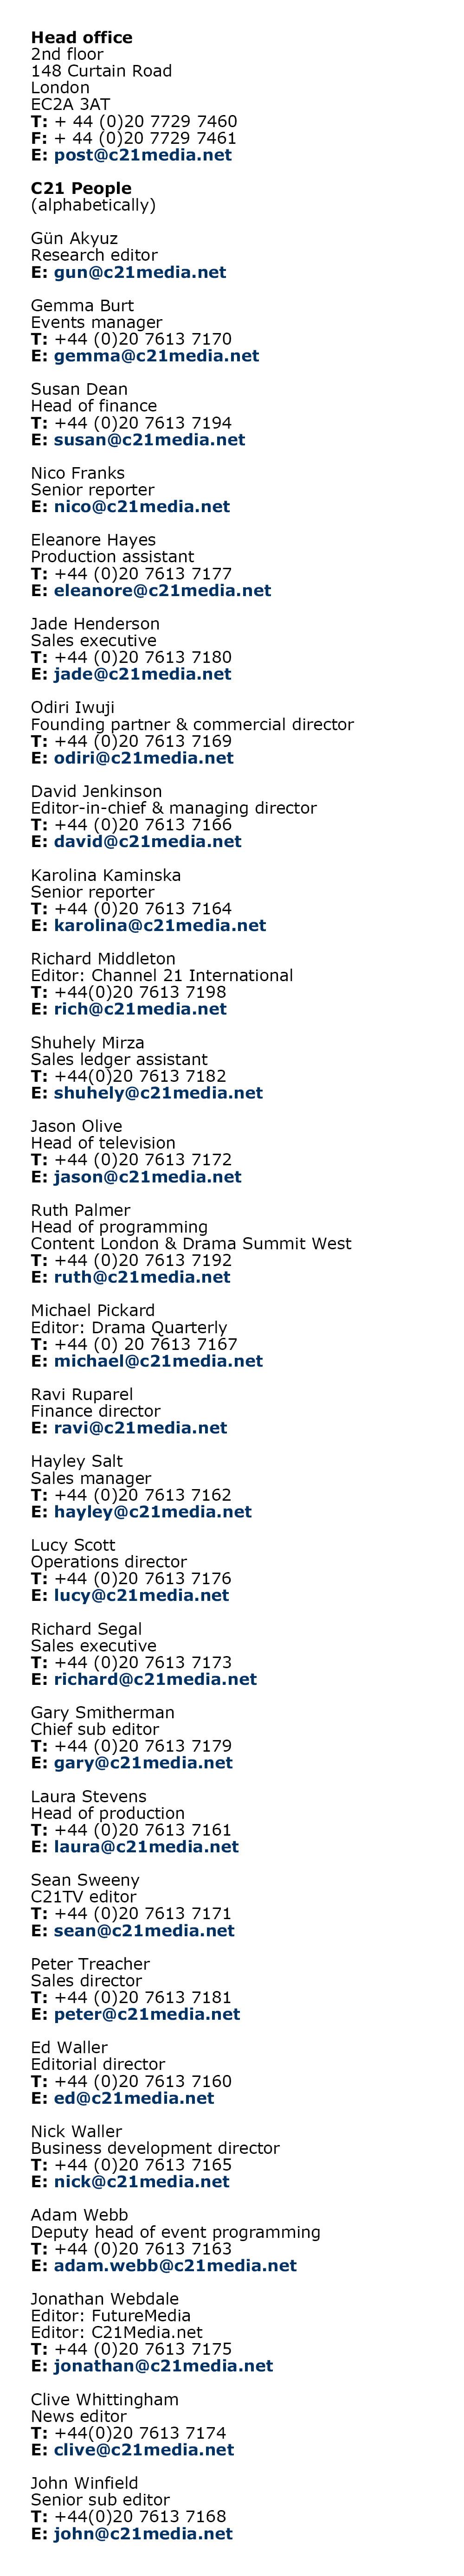 Web Contacts June 2019